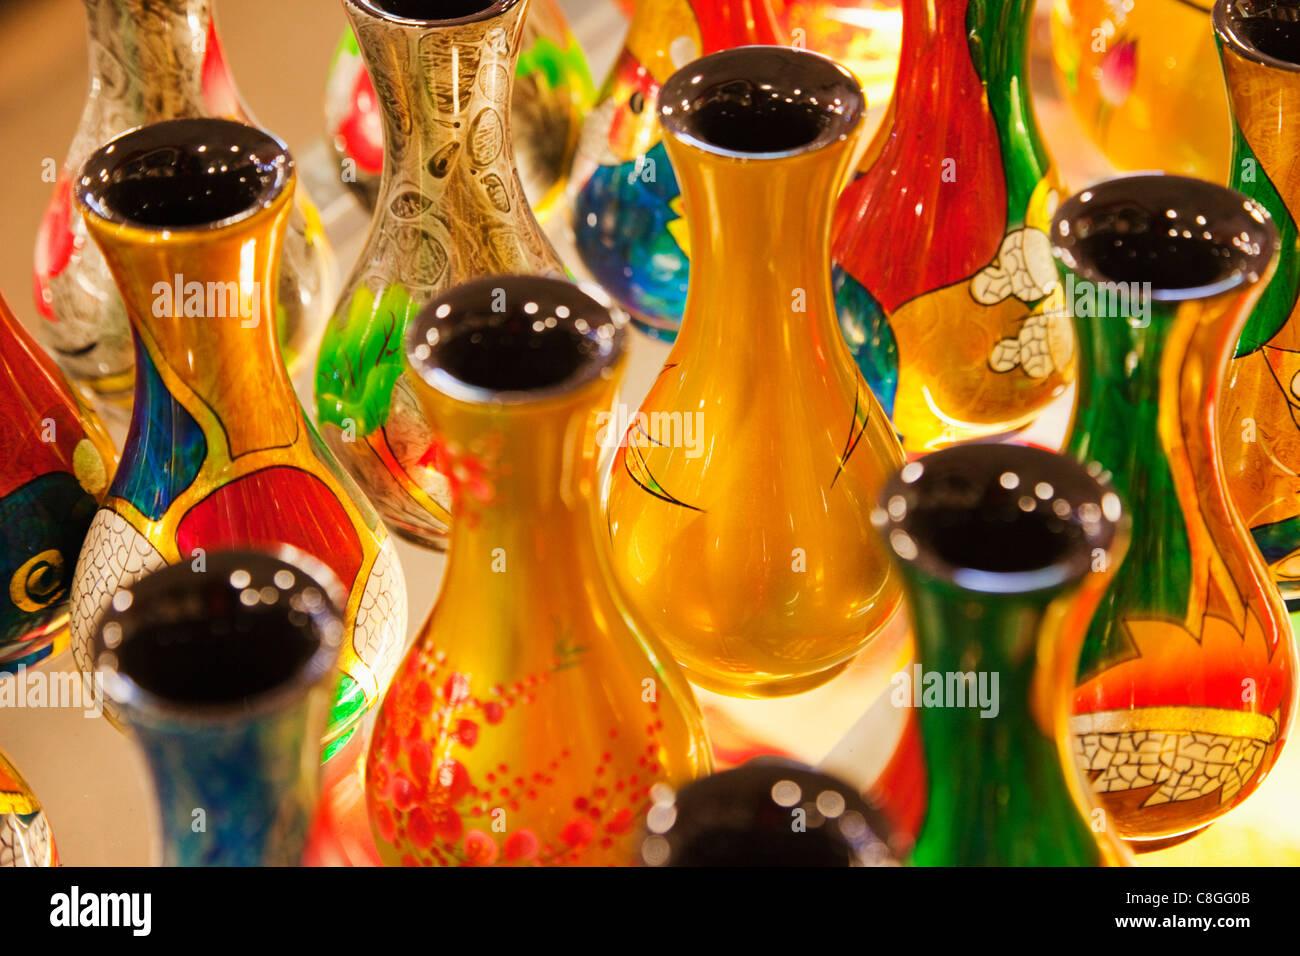 Asia, Vietnam, Hanoi, Laquerware, Artwork, Asian Art, Souvenirs, Shops, Shopping, Tourism, Travel, Holiday, Vacation - Stock Image